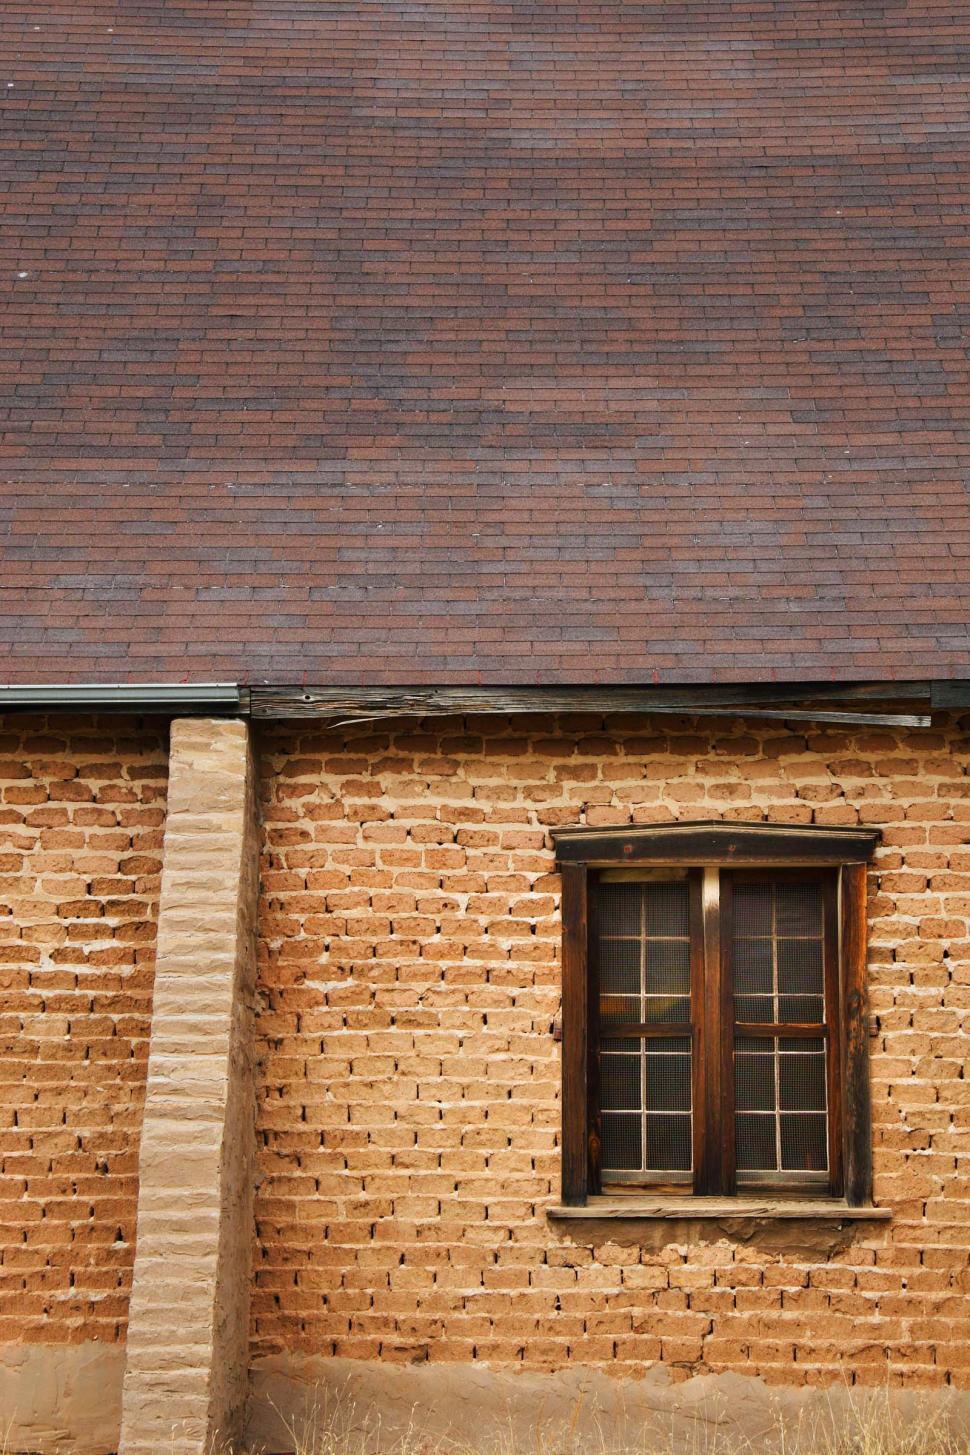 Download Free Stock Photo of adobe walls roof sloped windows wooden old bricks blocks mortar building shingled shingles gutters reinforced